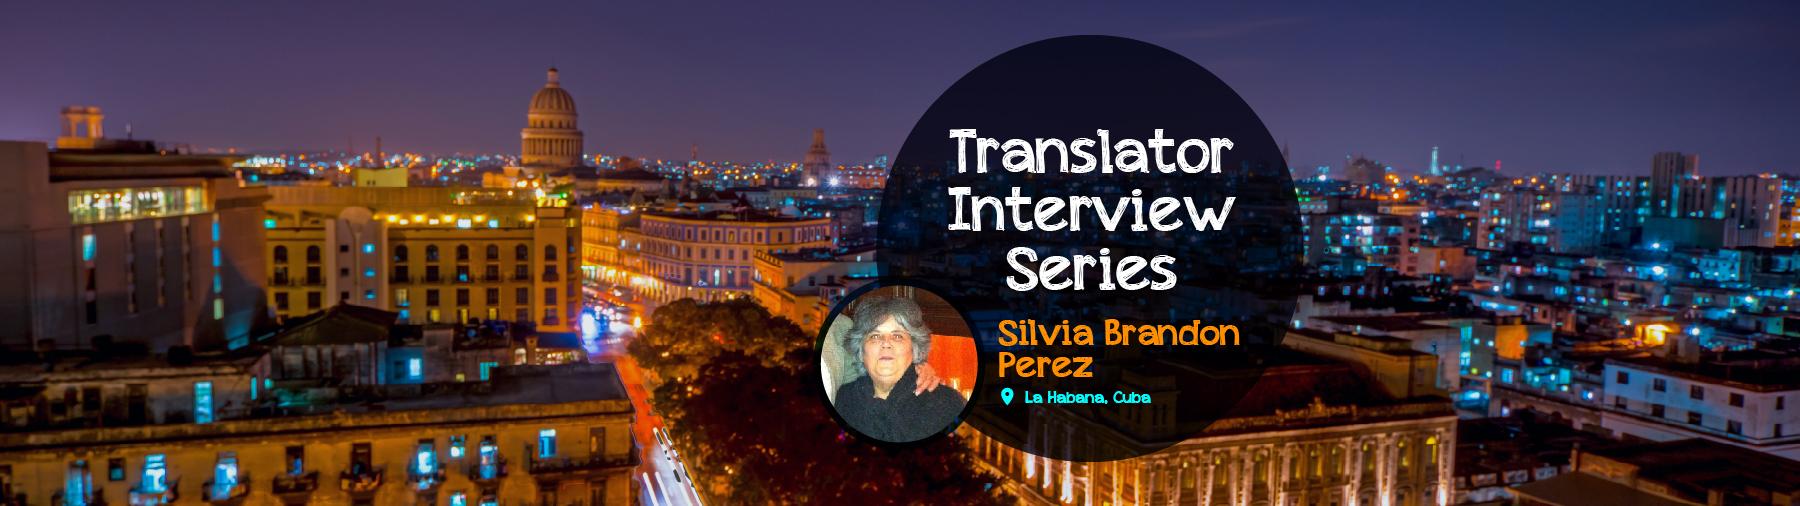 Translator Interview Silvia Brandon Perez